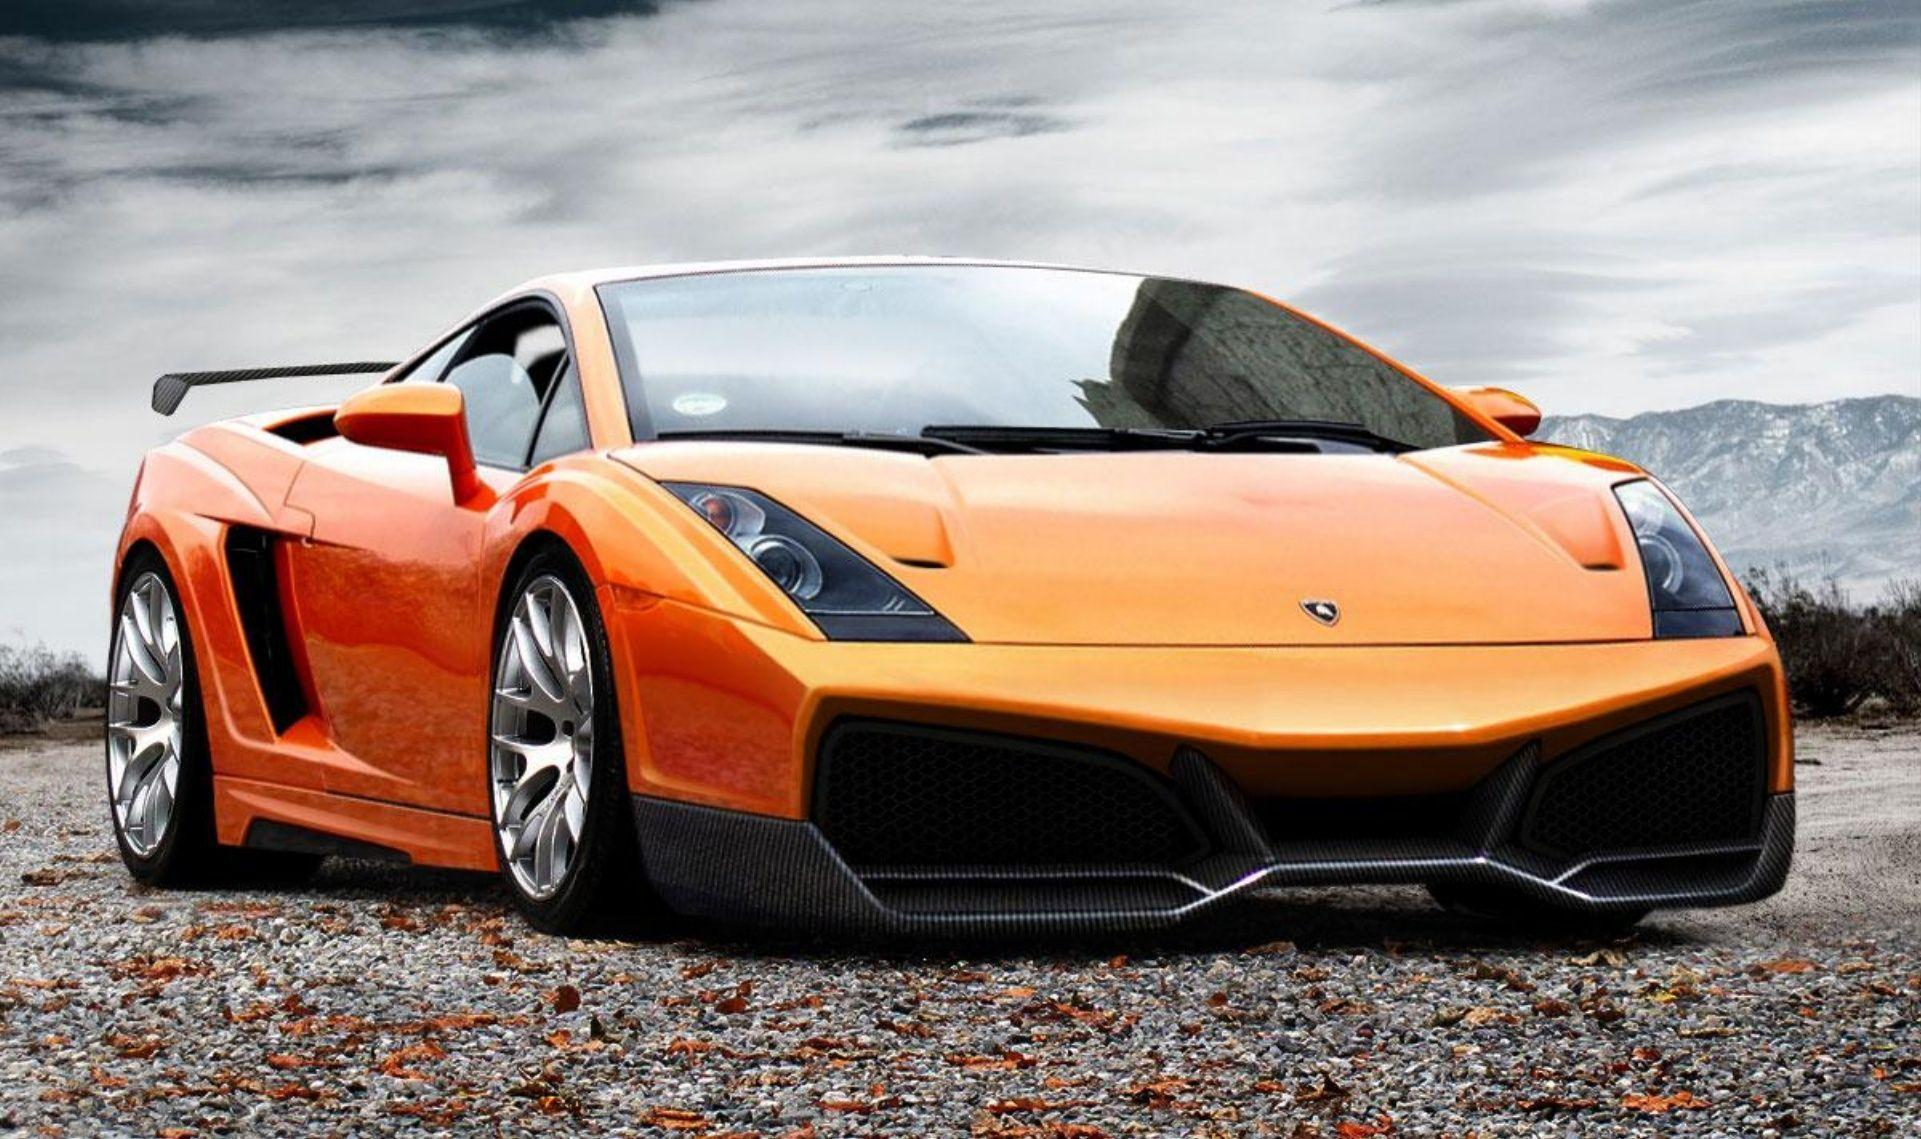 Lamborghini Gallardo Wallpapers Hd Wallpaper Cave